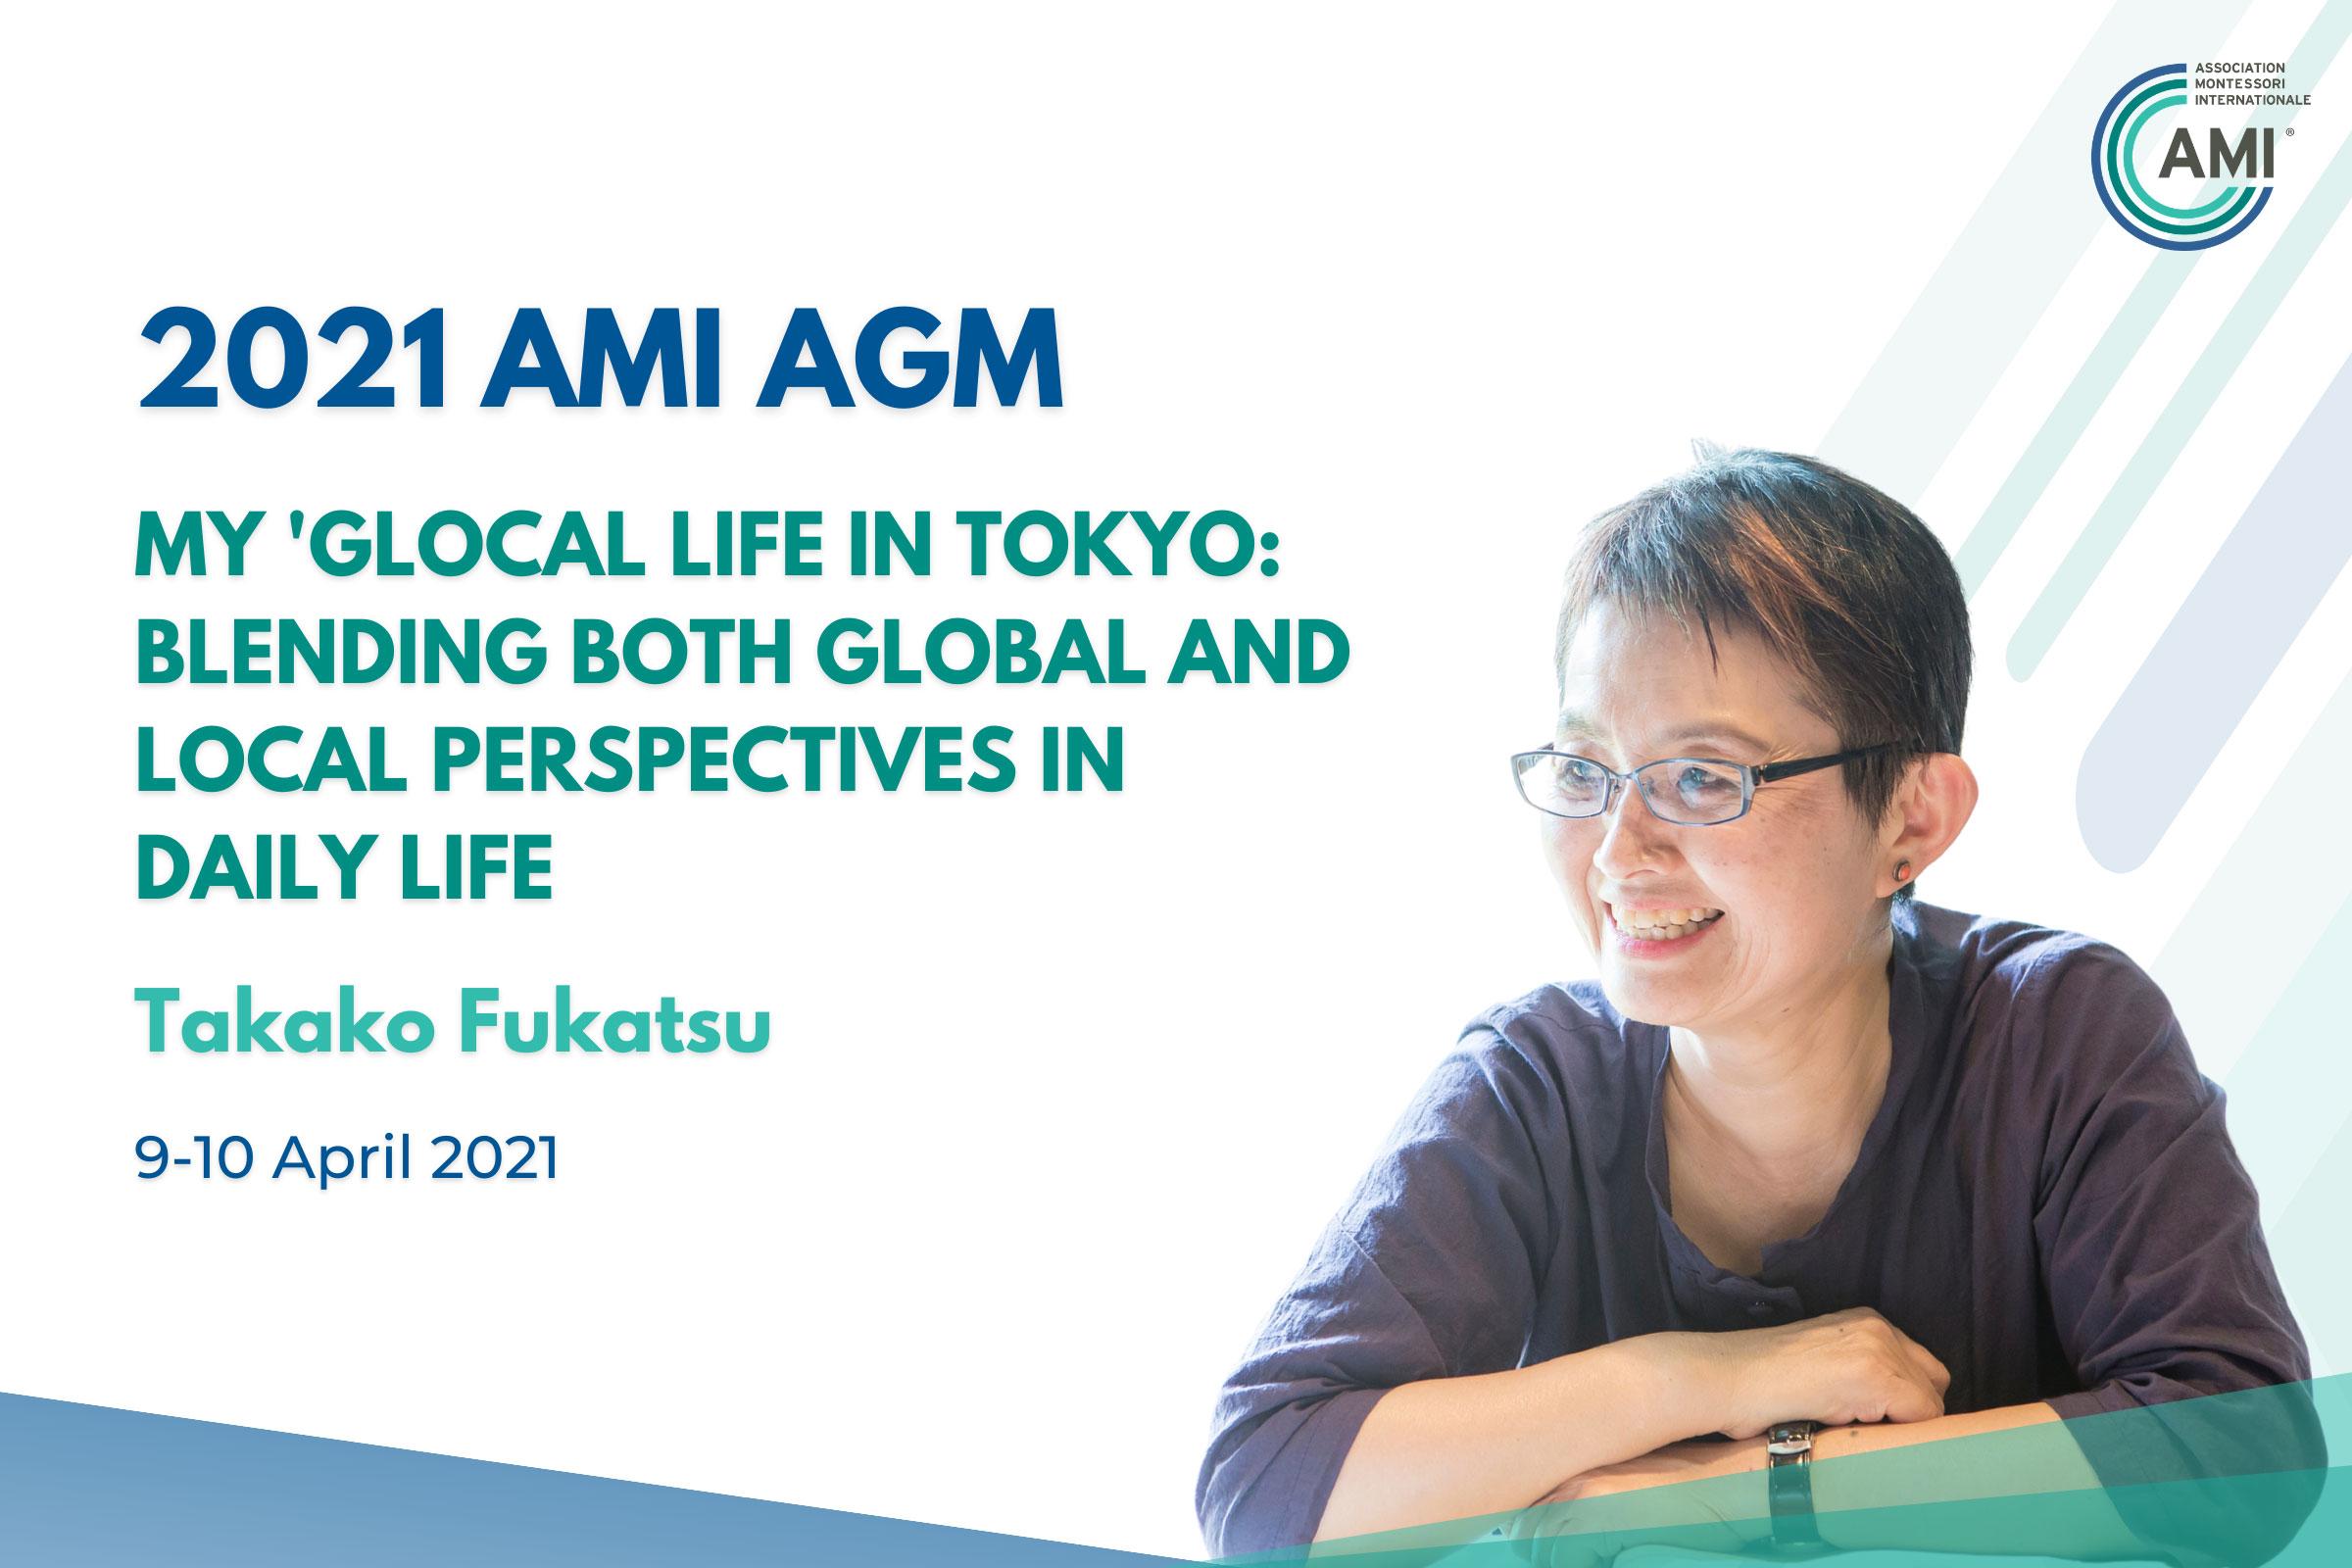 AMI AGM Speakers Takako Fukatsu